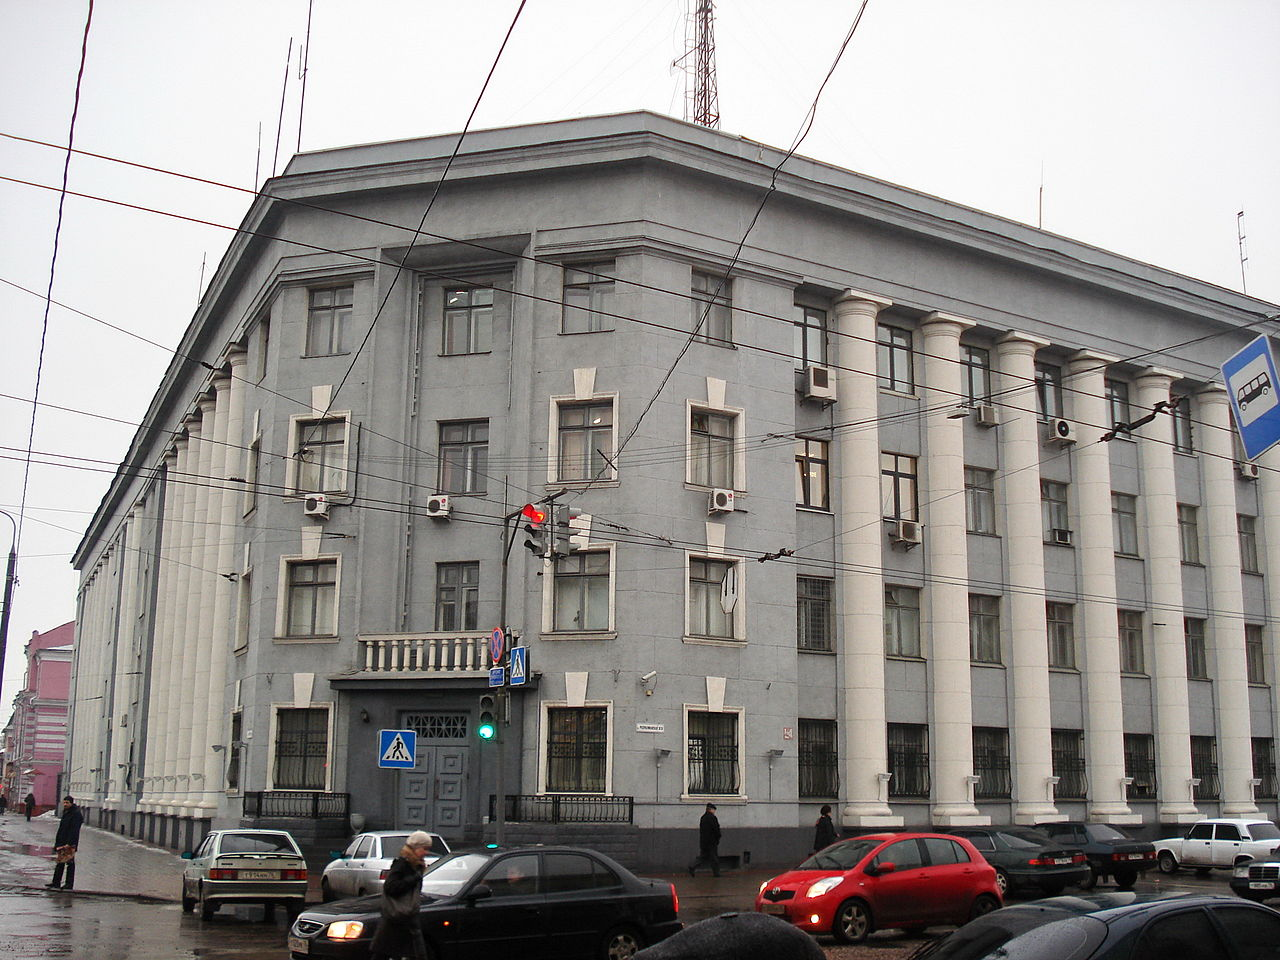 36-Office_of_Internal_Affairs_(UVD)_in_Yaroslavl_01.jpg